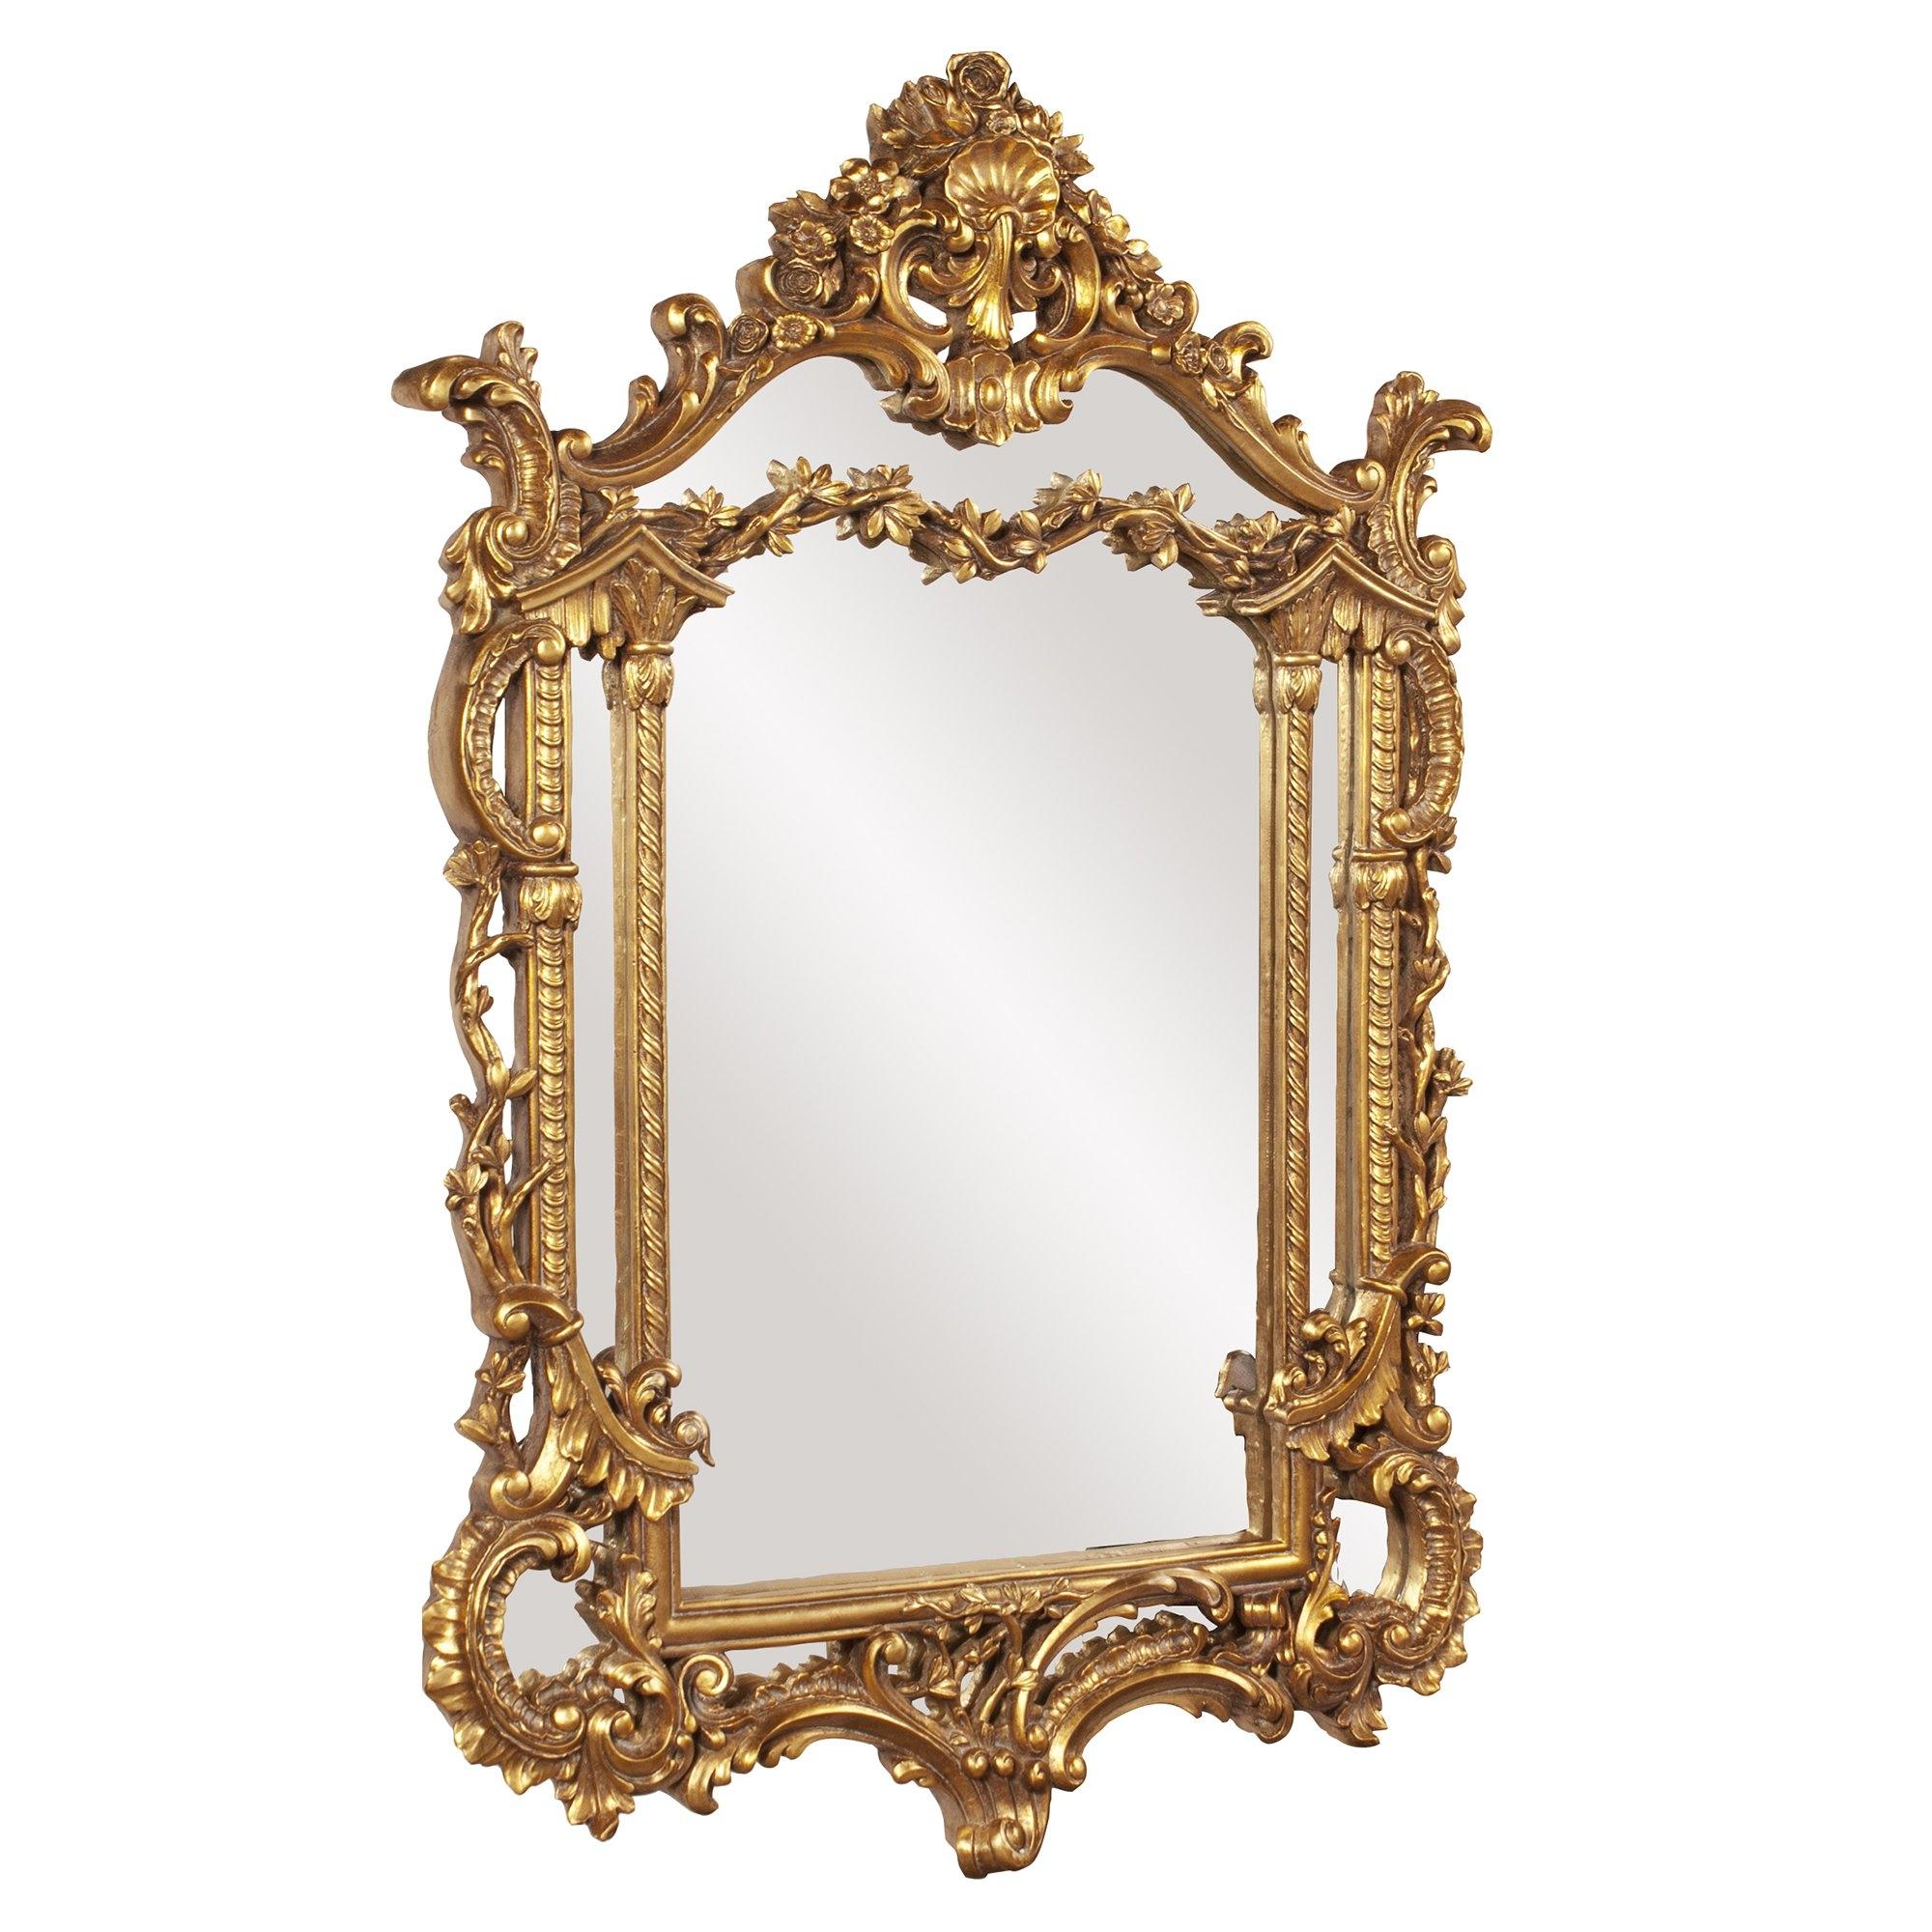 Astoria Grand Antique Gold Vertical Baroque Mirror Reviews Wayfair For Baroque Mirror (Image 1 of 15)